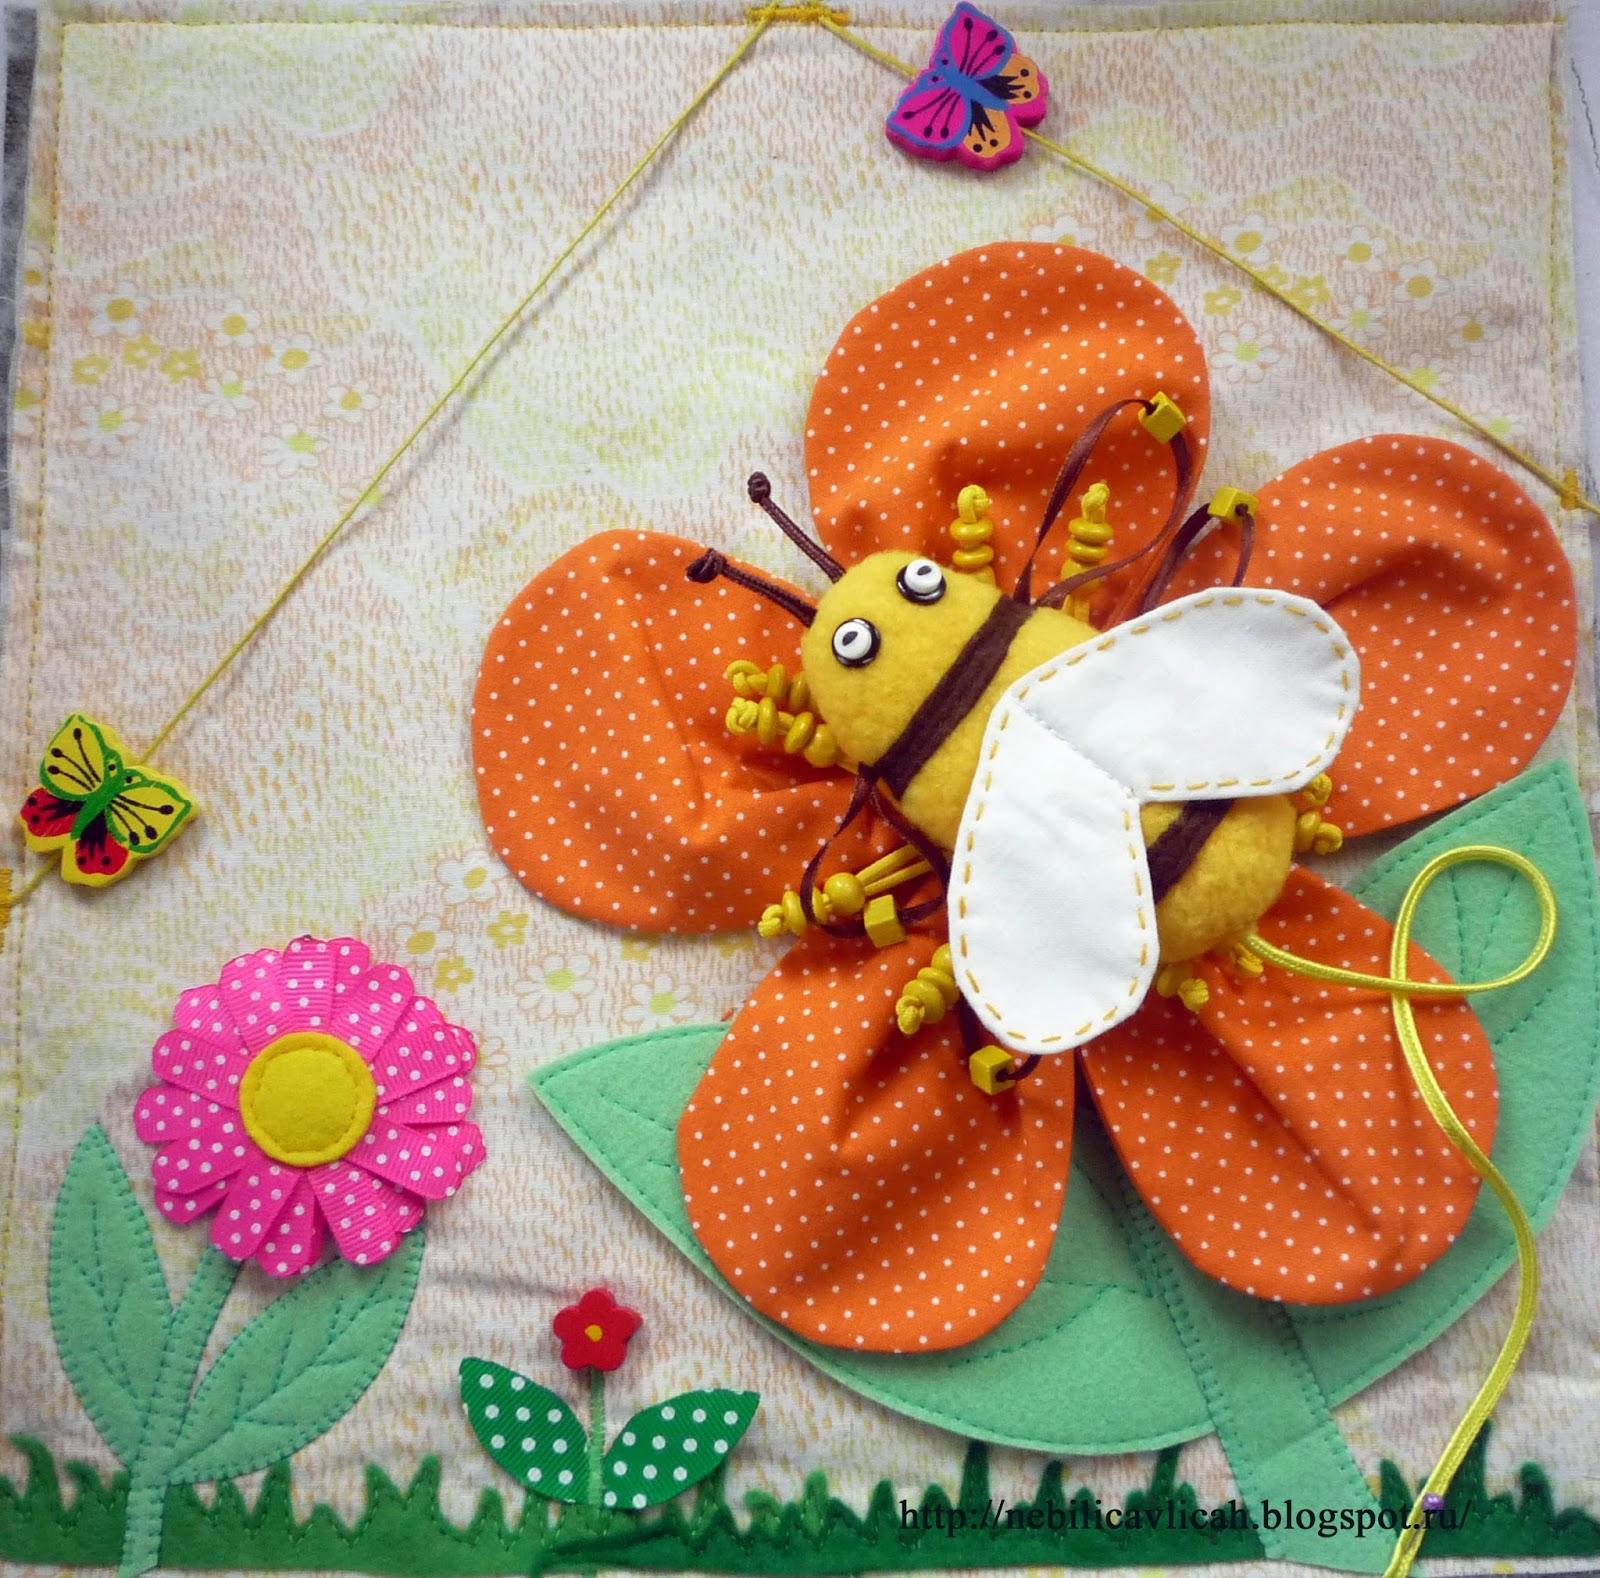 развивалки развивающая книжка пчелка развивашка